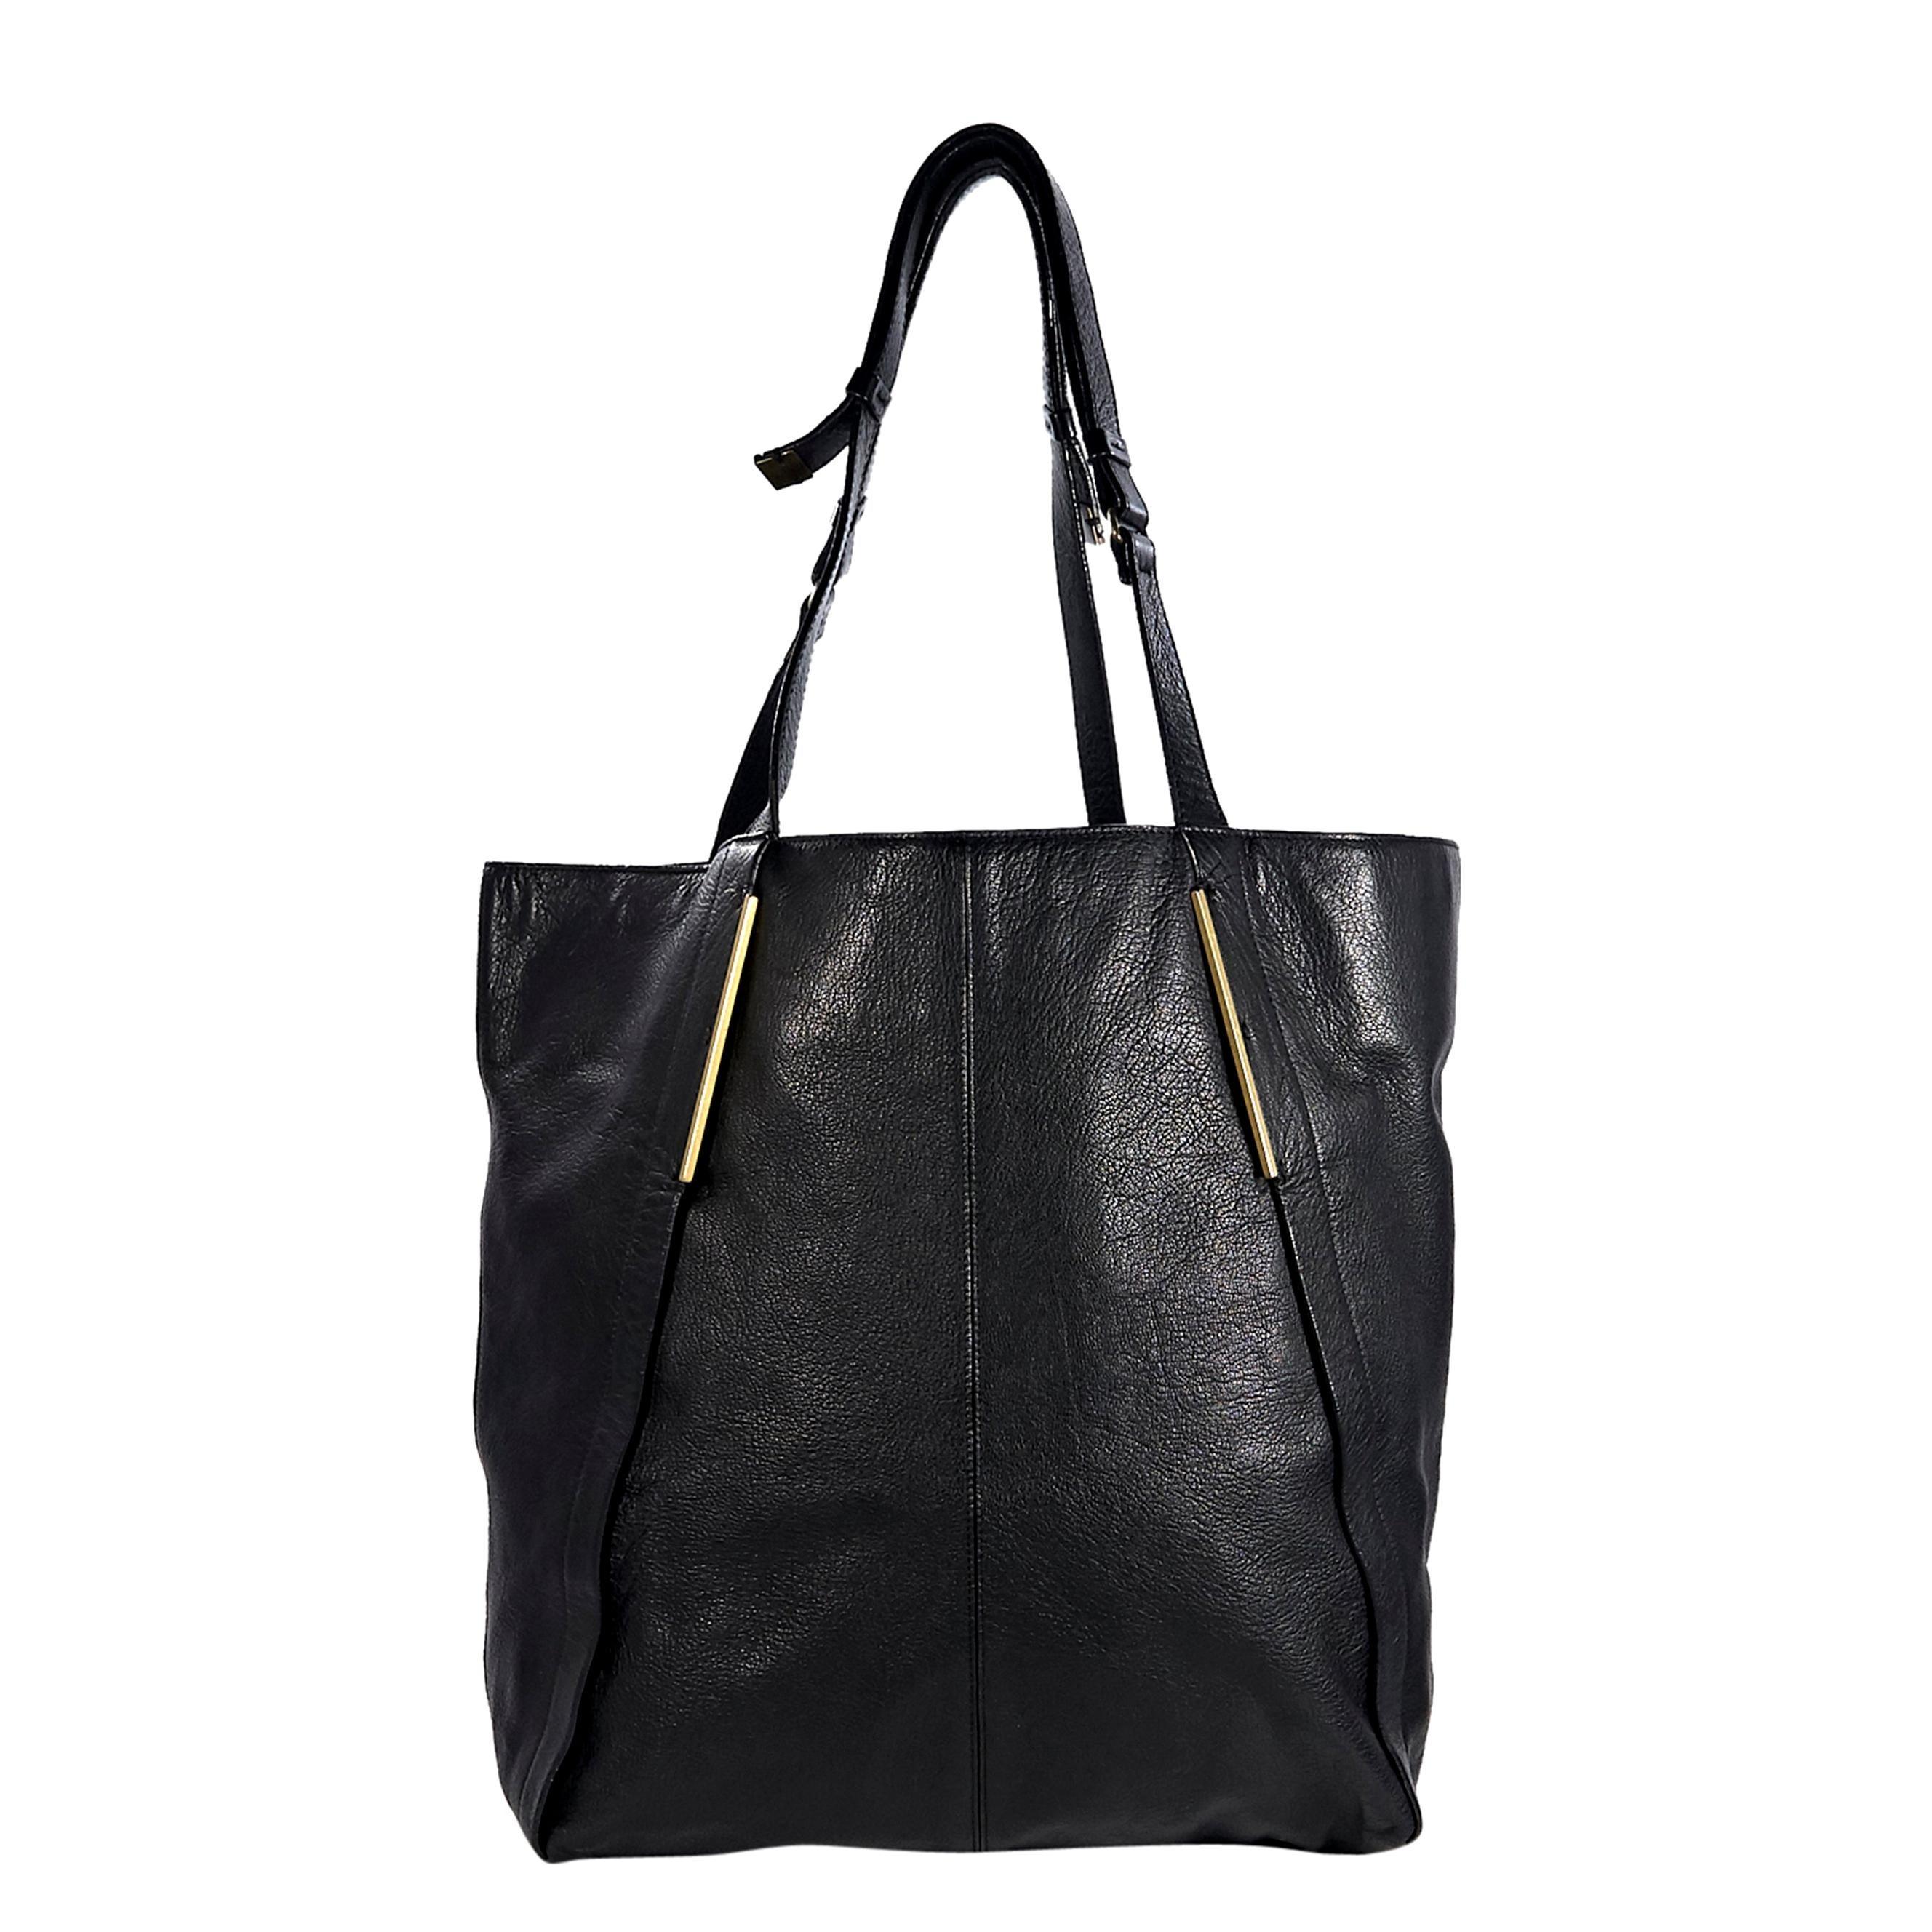 dcdf13706 Lanvin Trilogy Women Tote Bag black-cream LAN001-BKCR For Sale at 1stdibs